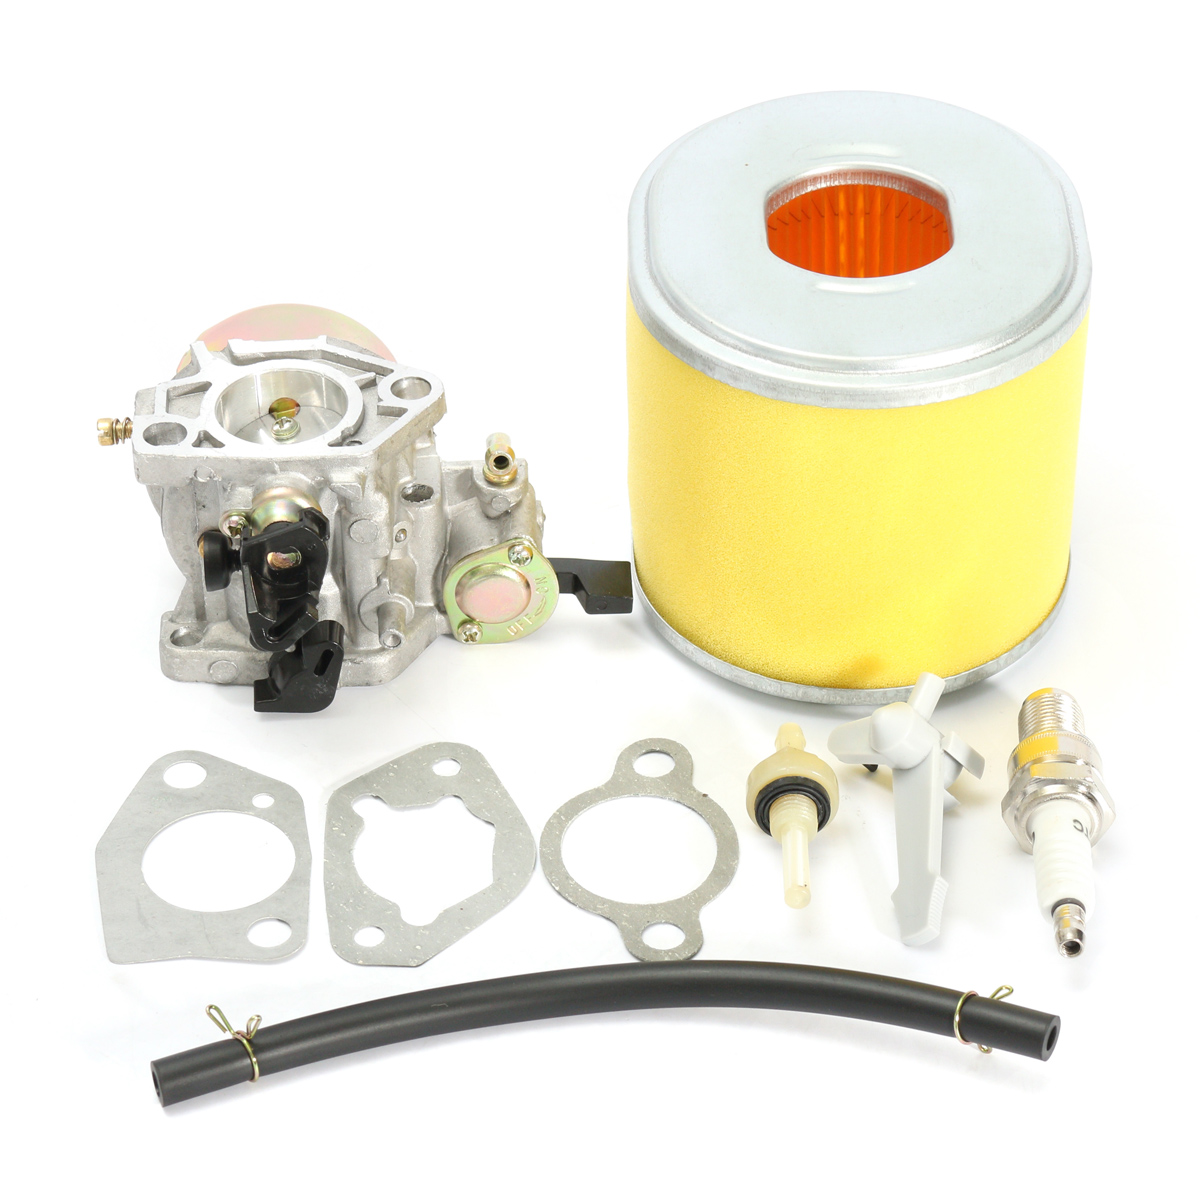 Carburetor Carb Air Filter Spark Plug Fuel Valve Pipe For Honda GX340 11HP